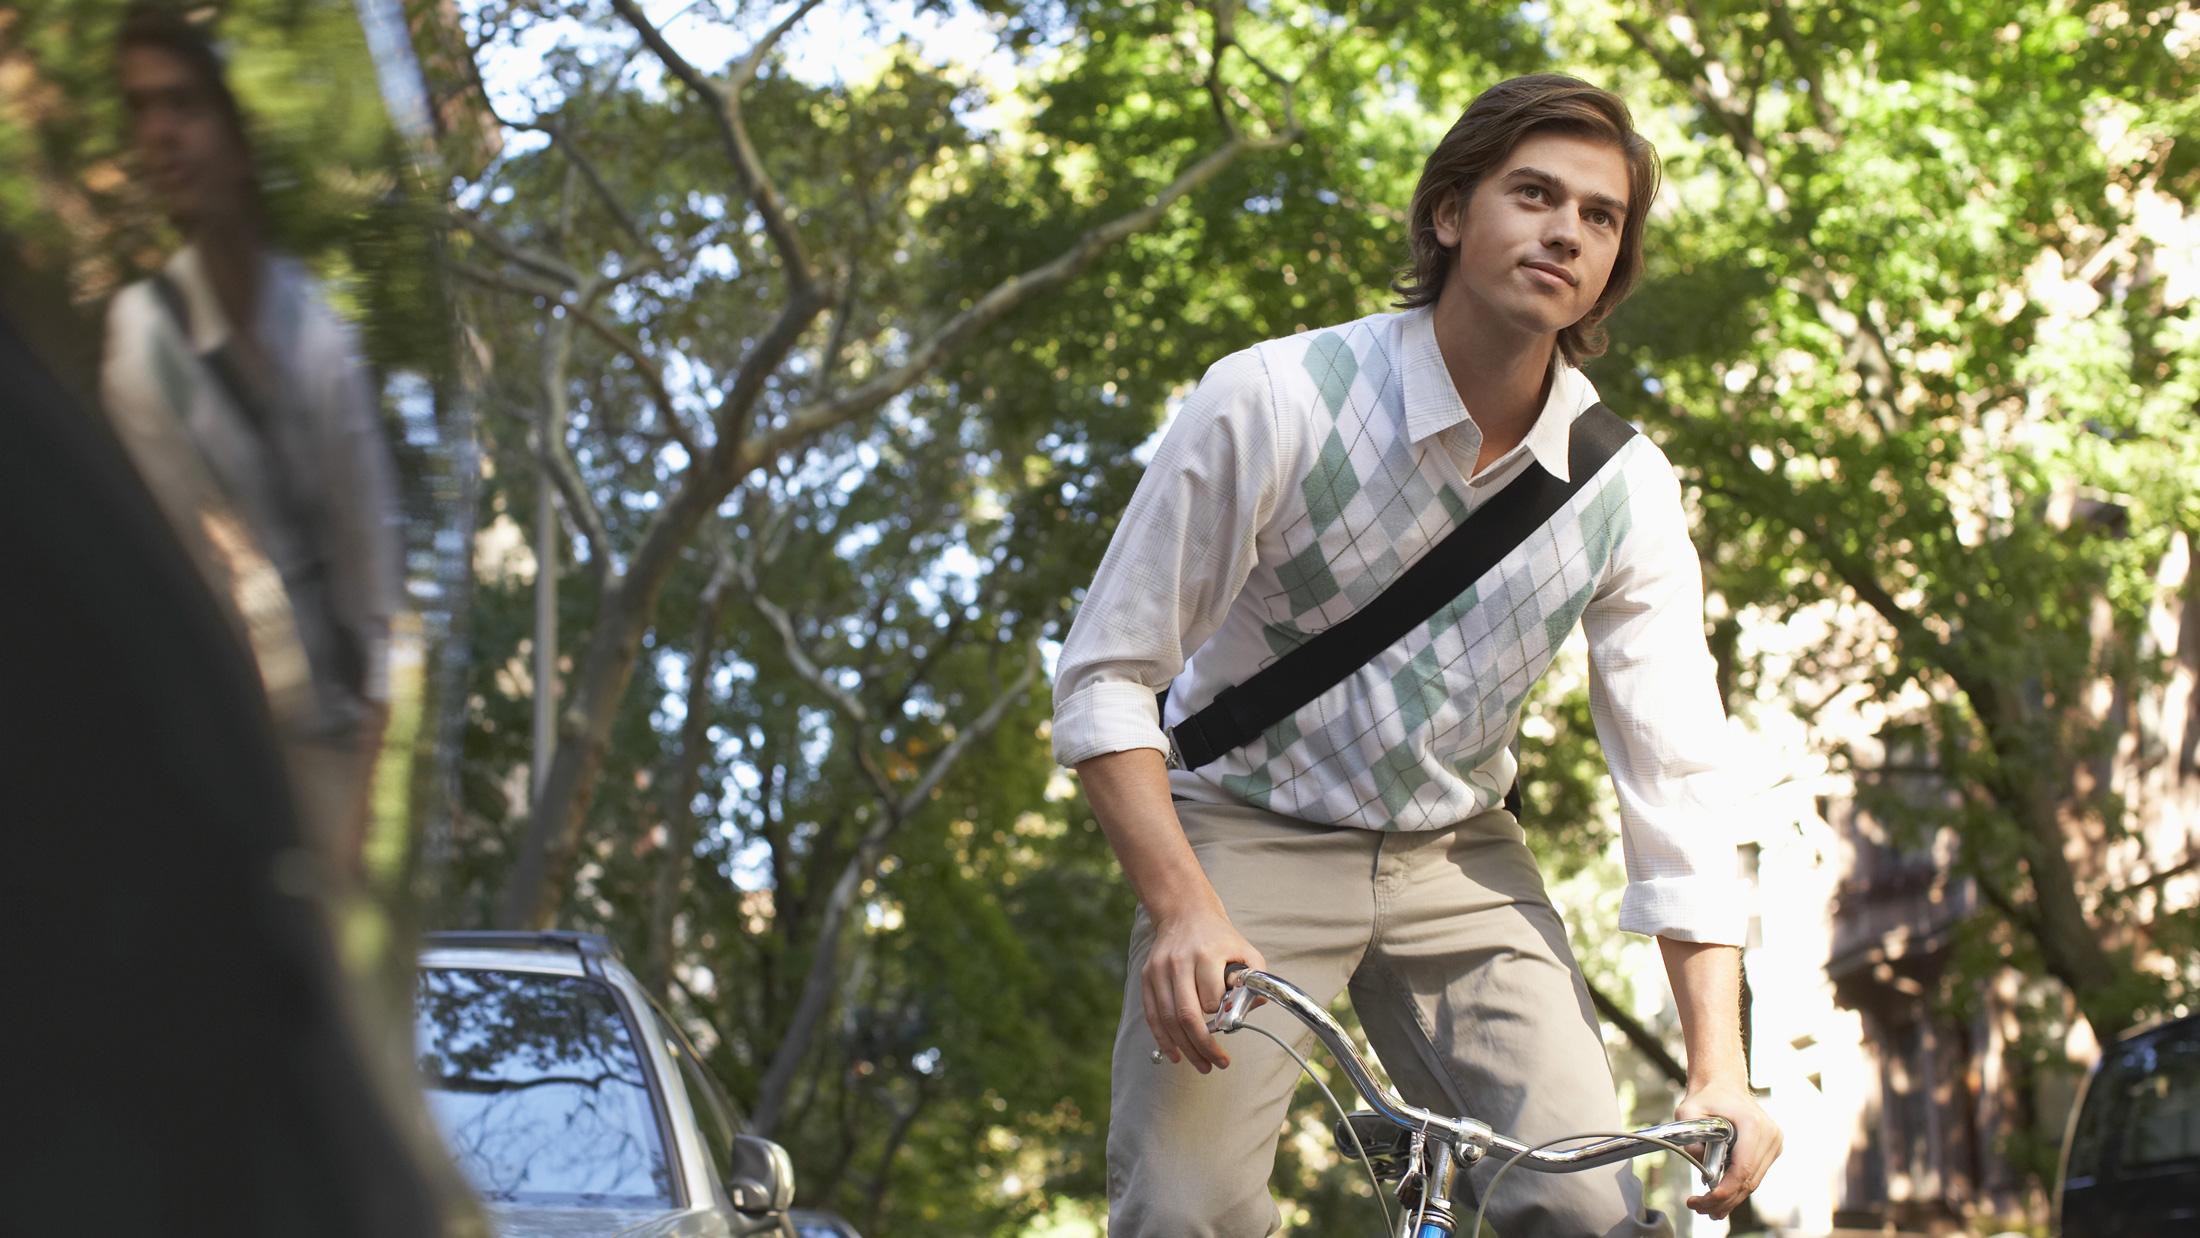 preppy guy on bike